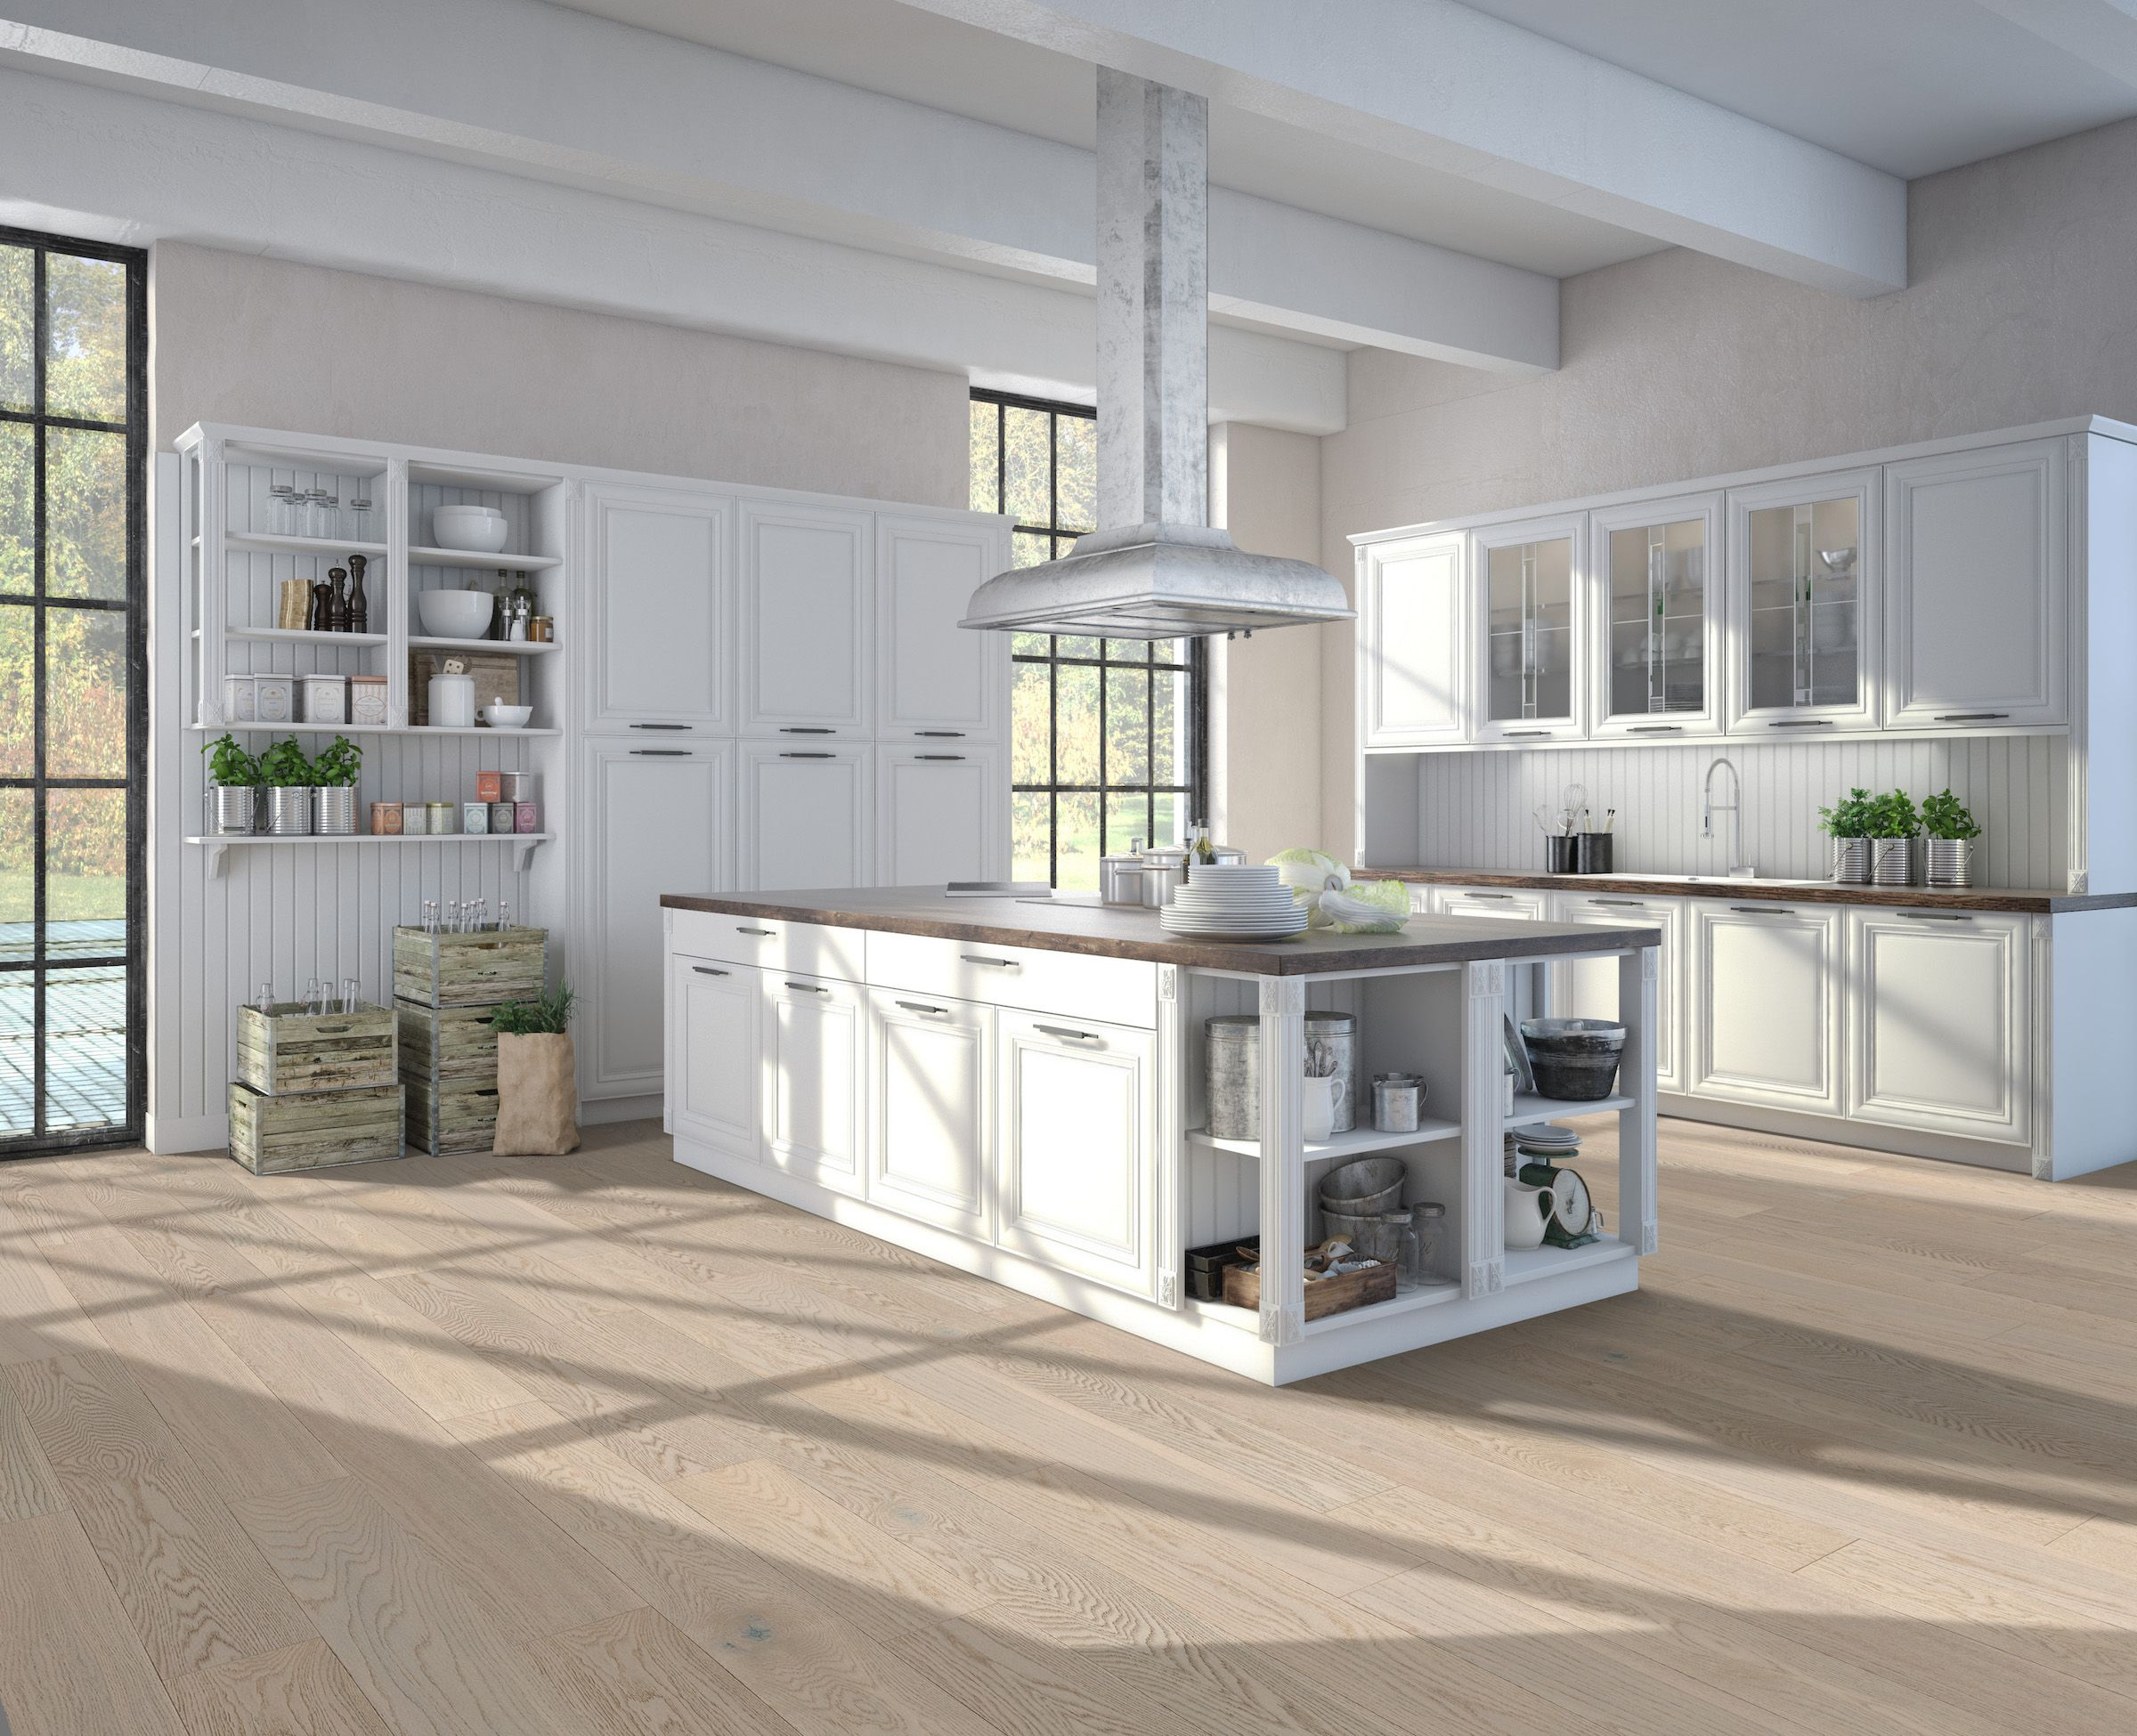 Balzac Flooring Solutions Muskoka Commercial flooring